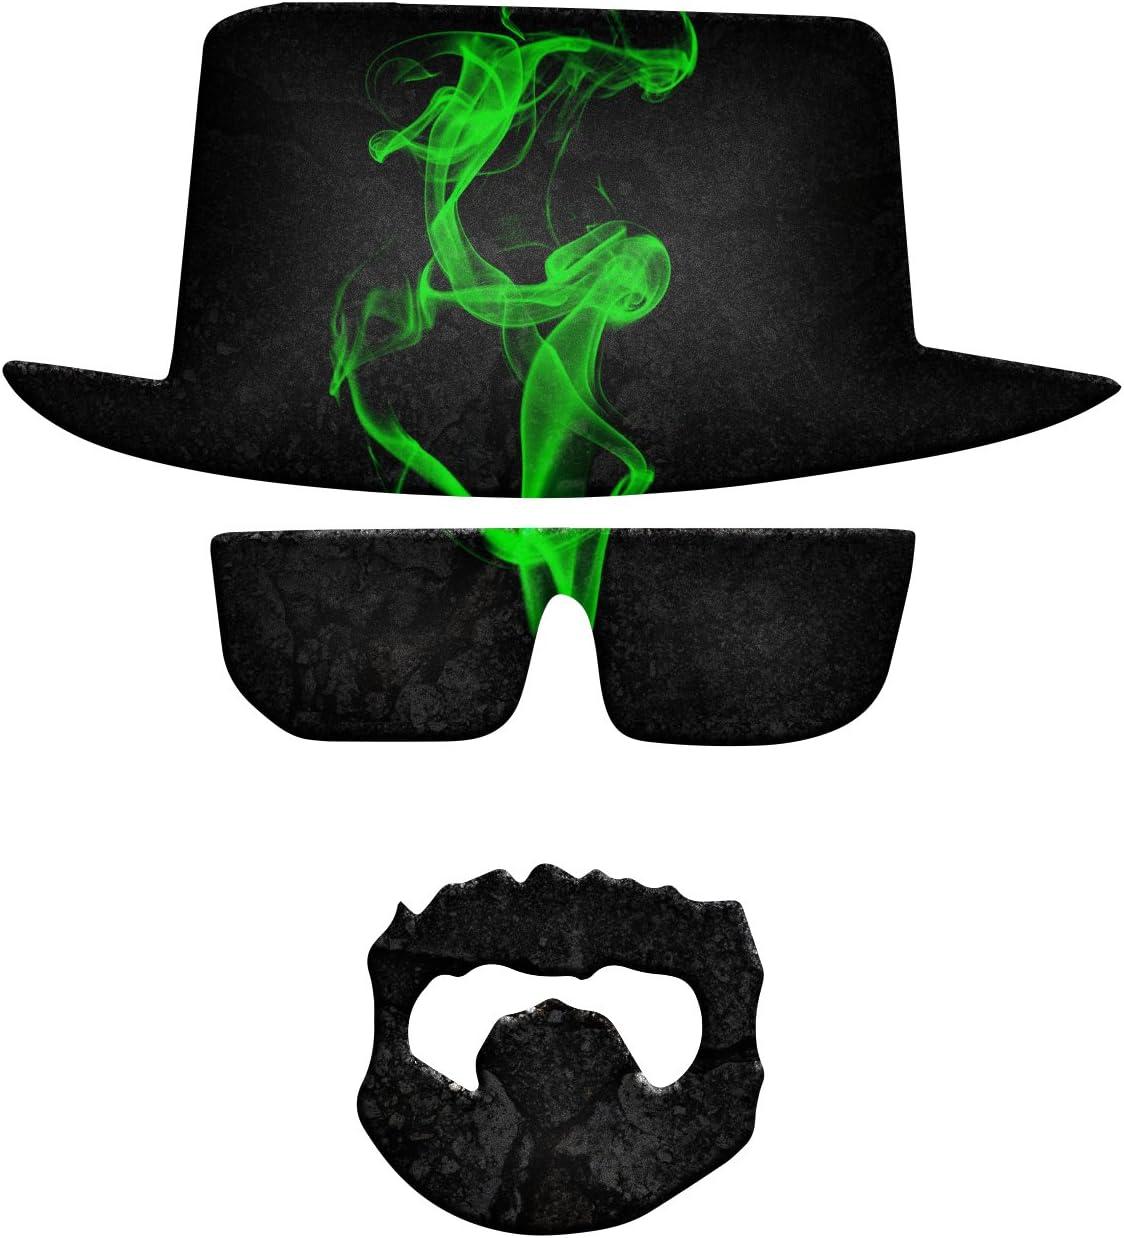 "Bargain Max Decals Breaking Chemistry Bad Green Smoke Heisenberg Window Laptop Car Sticker 6"""